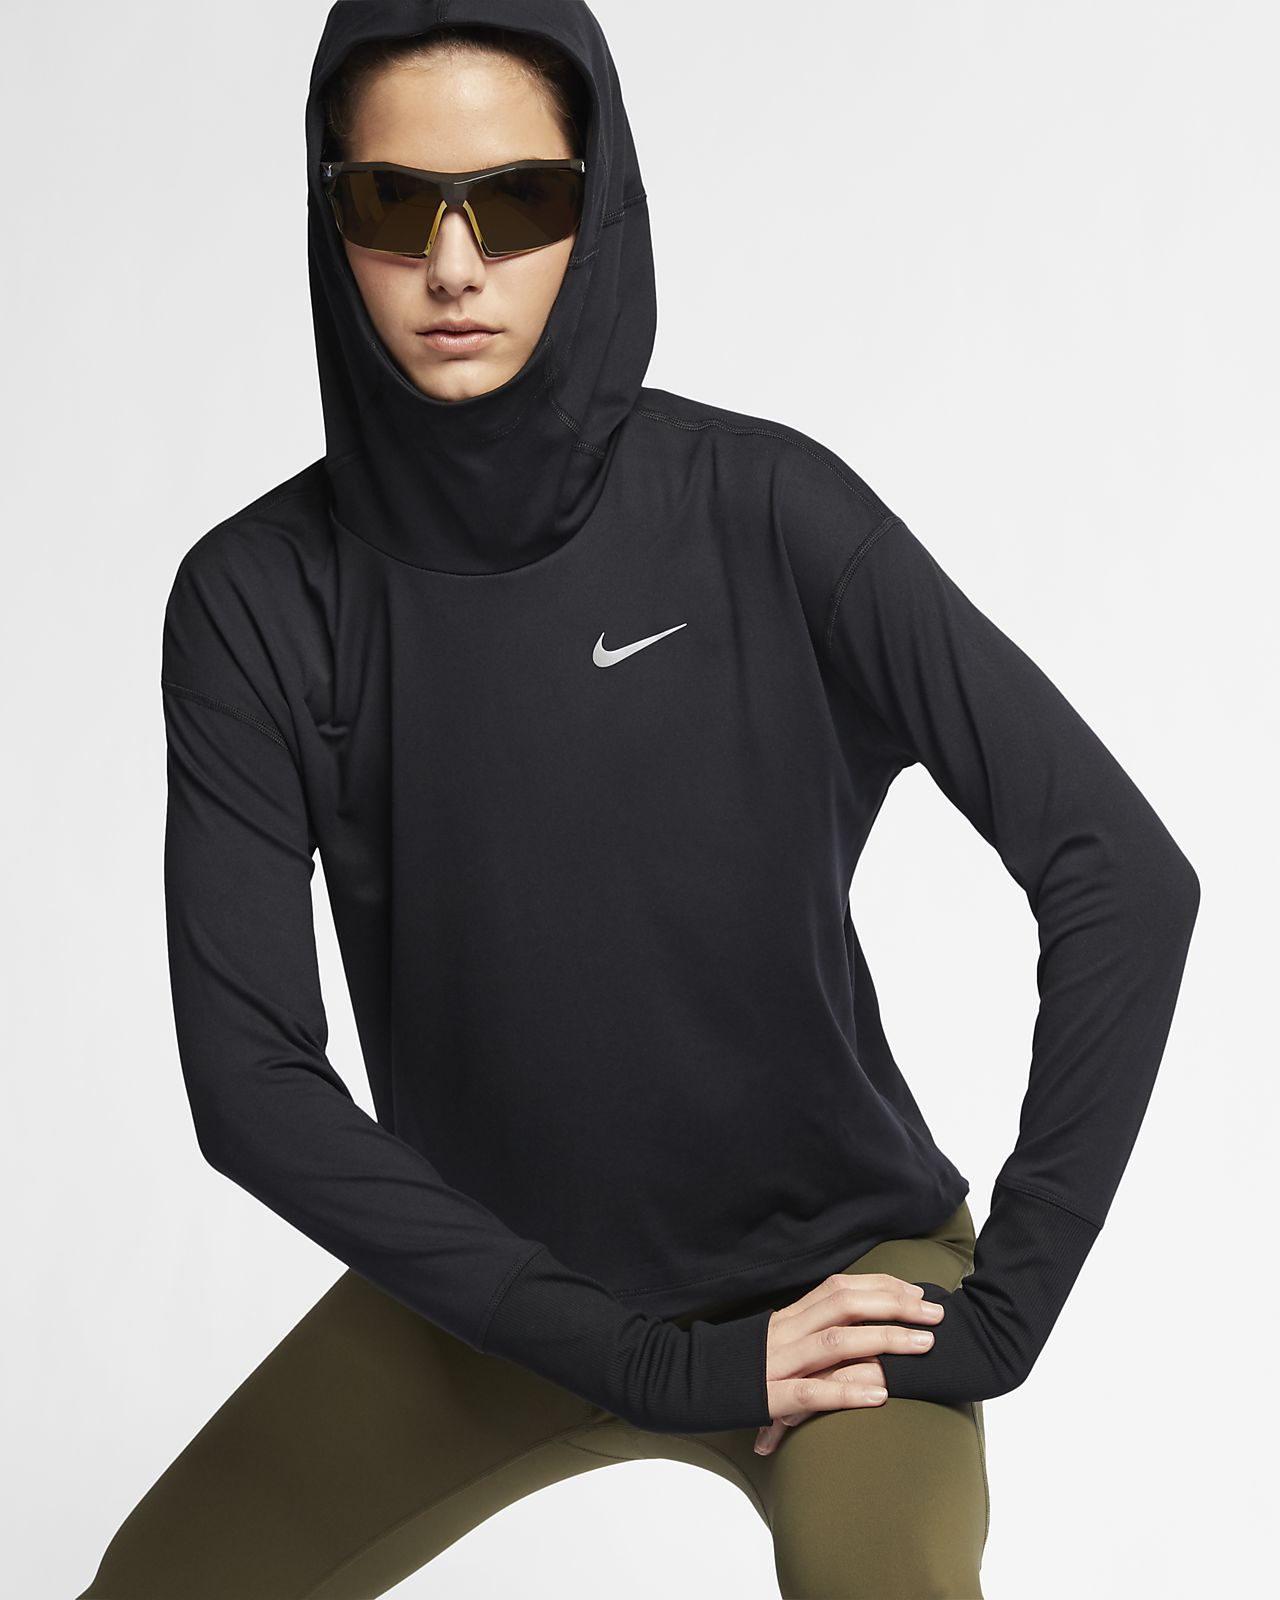 Sudadera con capucha de running para mujer Nike Element